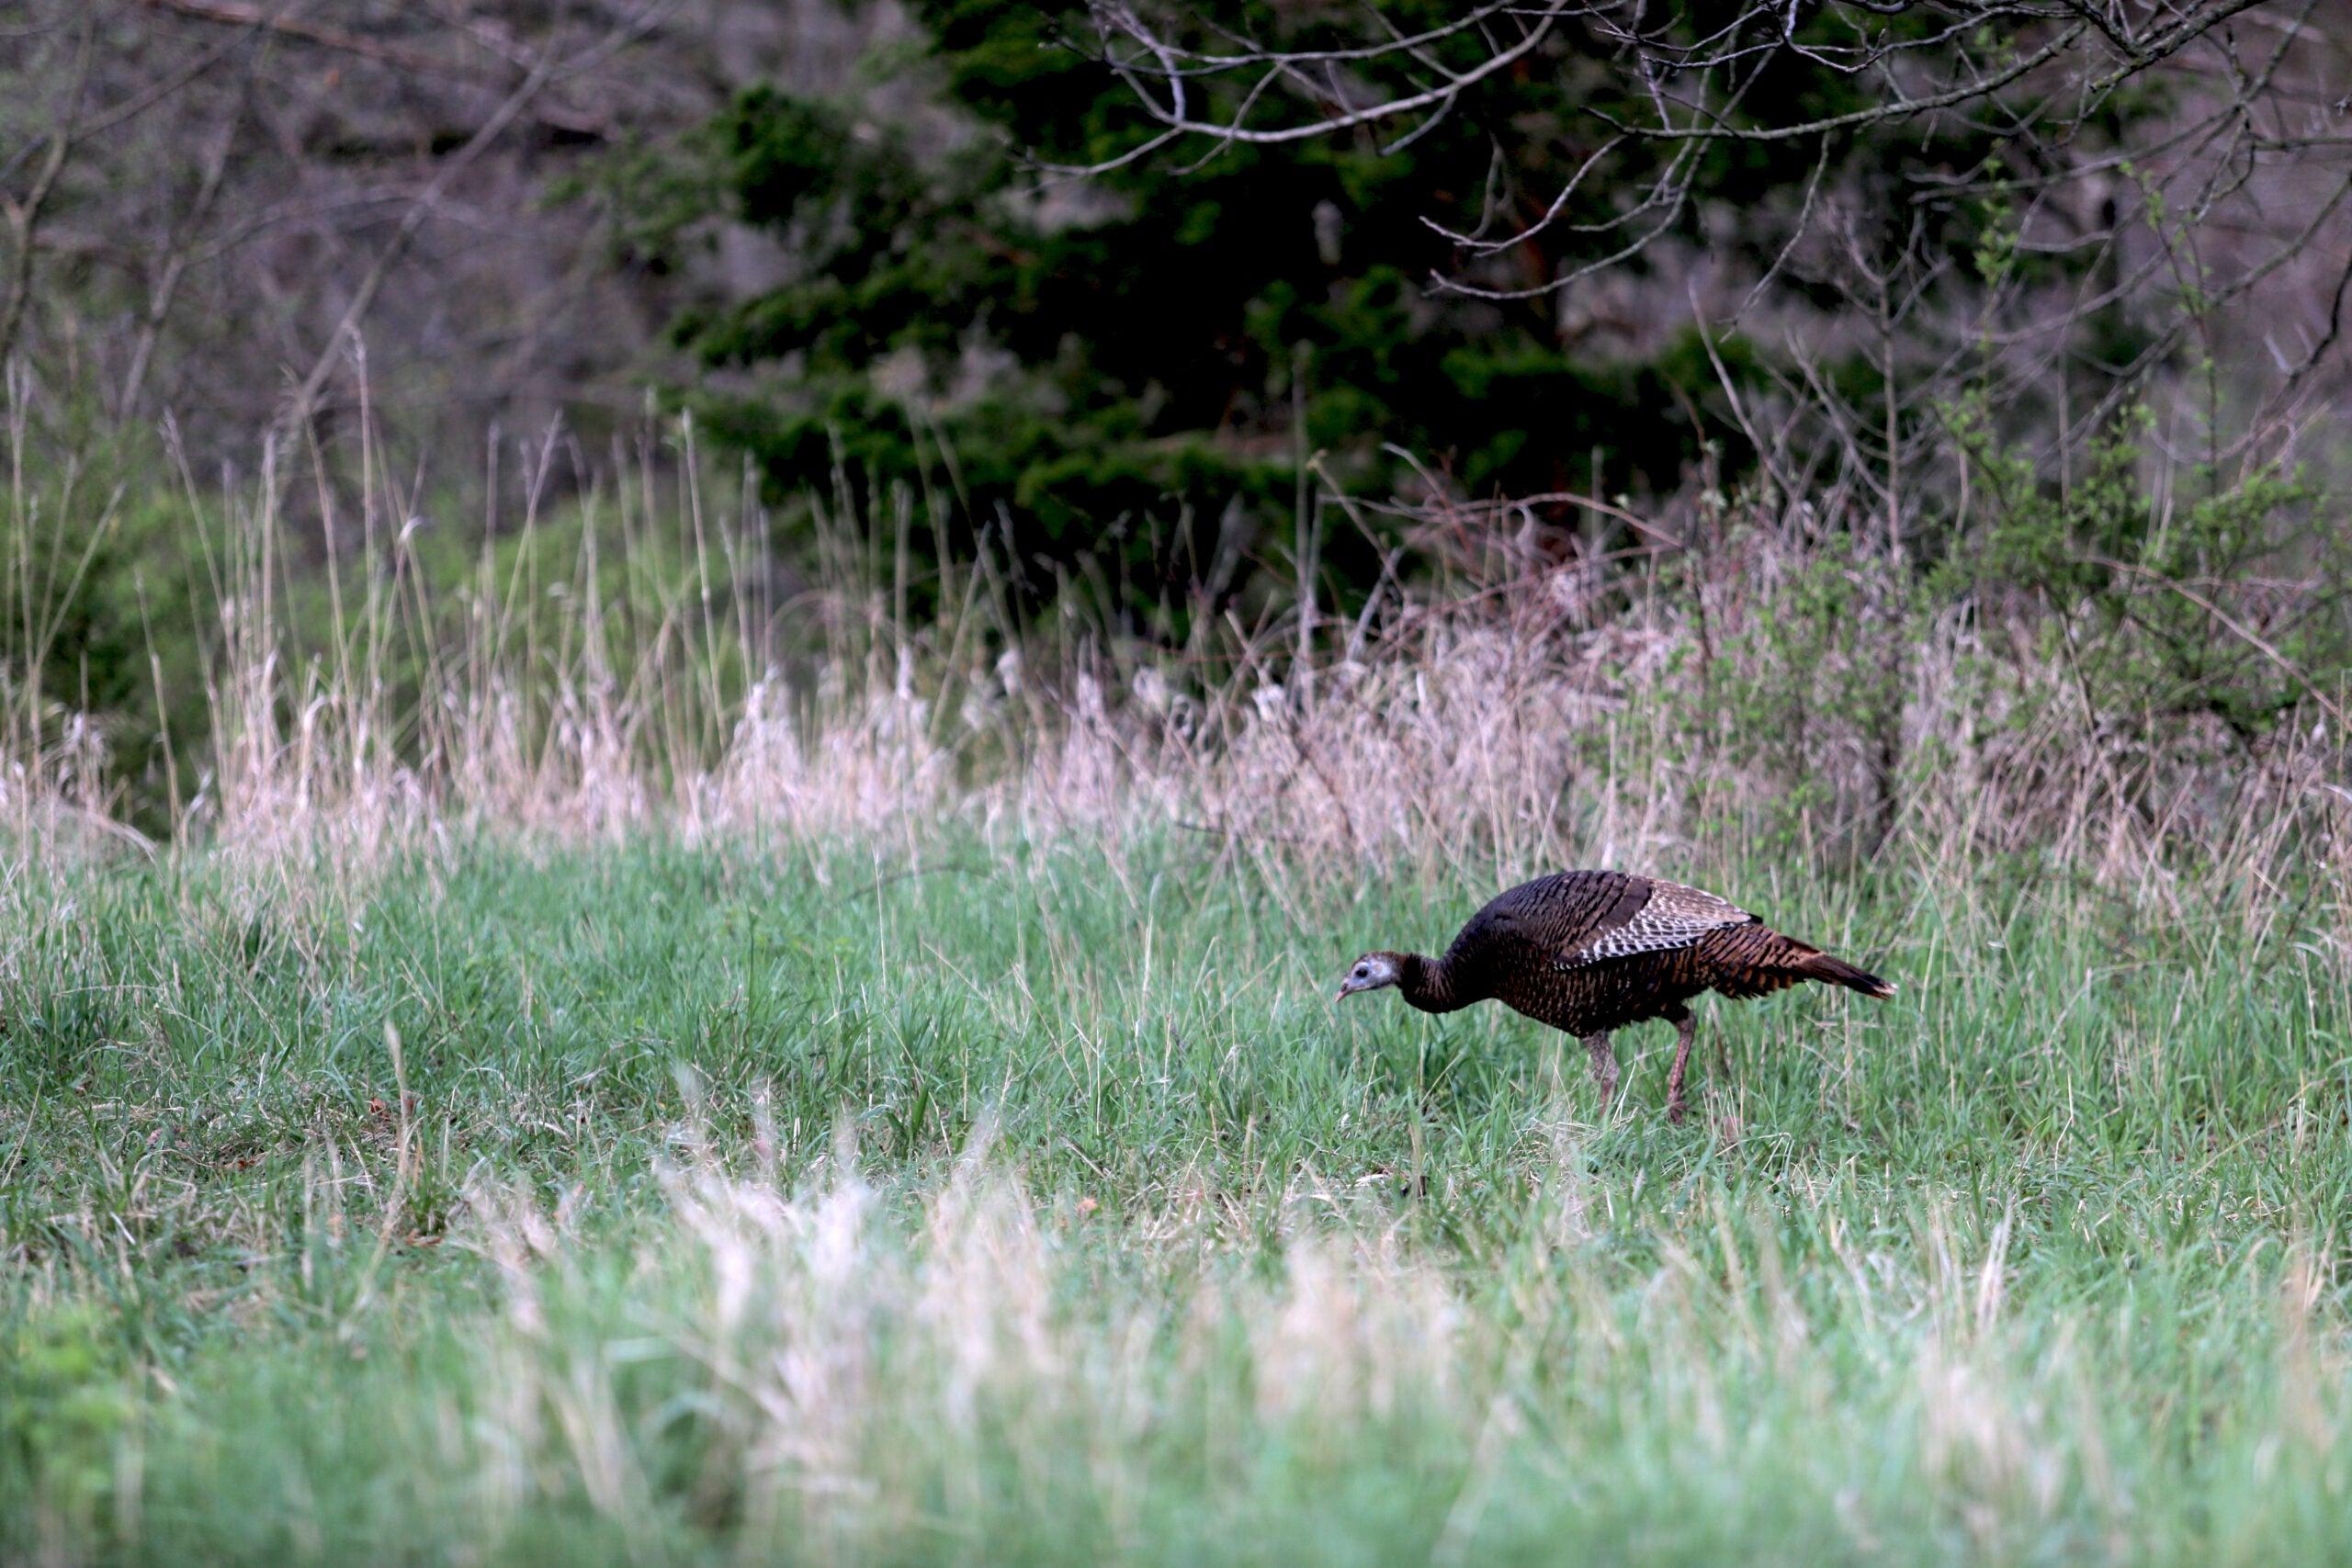 Gobbler Grub: Plant Native Food Sources for Bigger, Healthier Turkeys